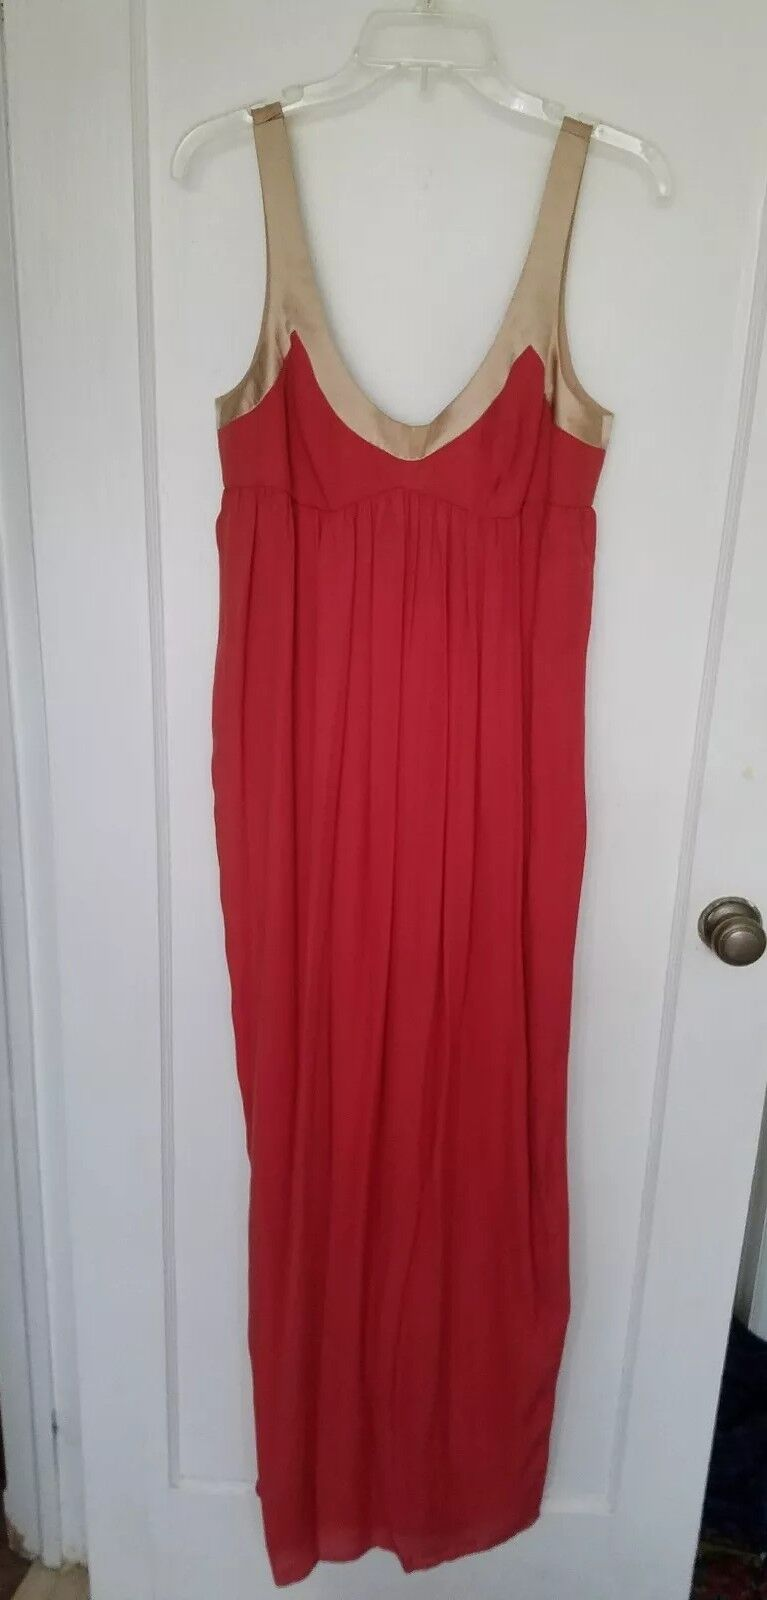 NWT Laundry by Design Coral Empire Waist Evening Maxi Dress Größe 6